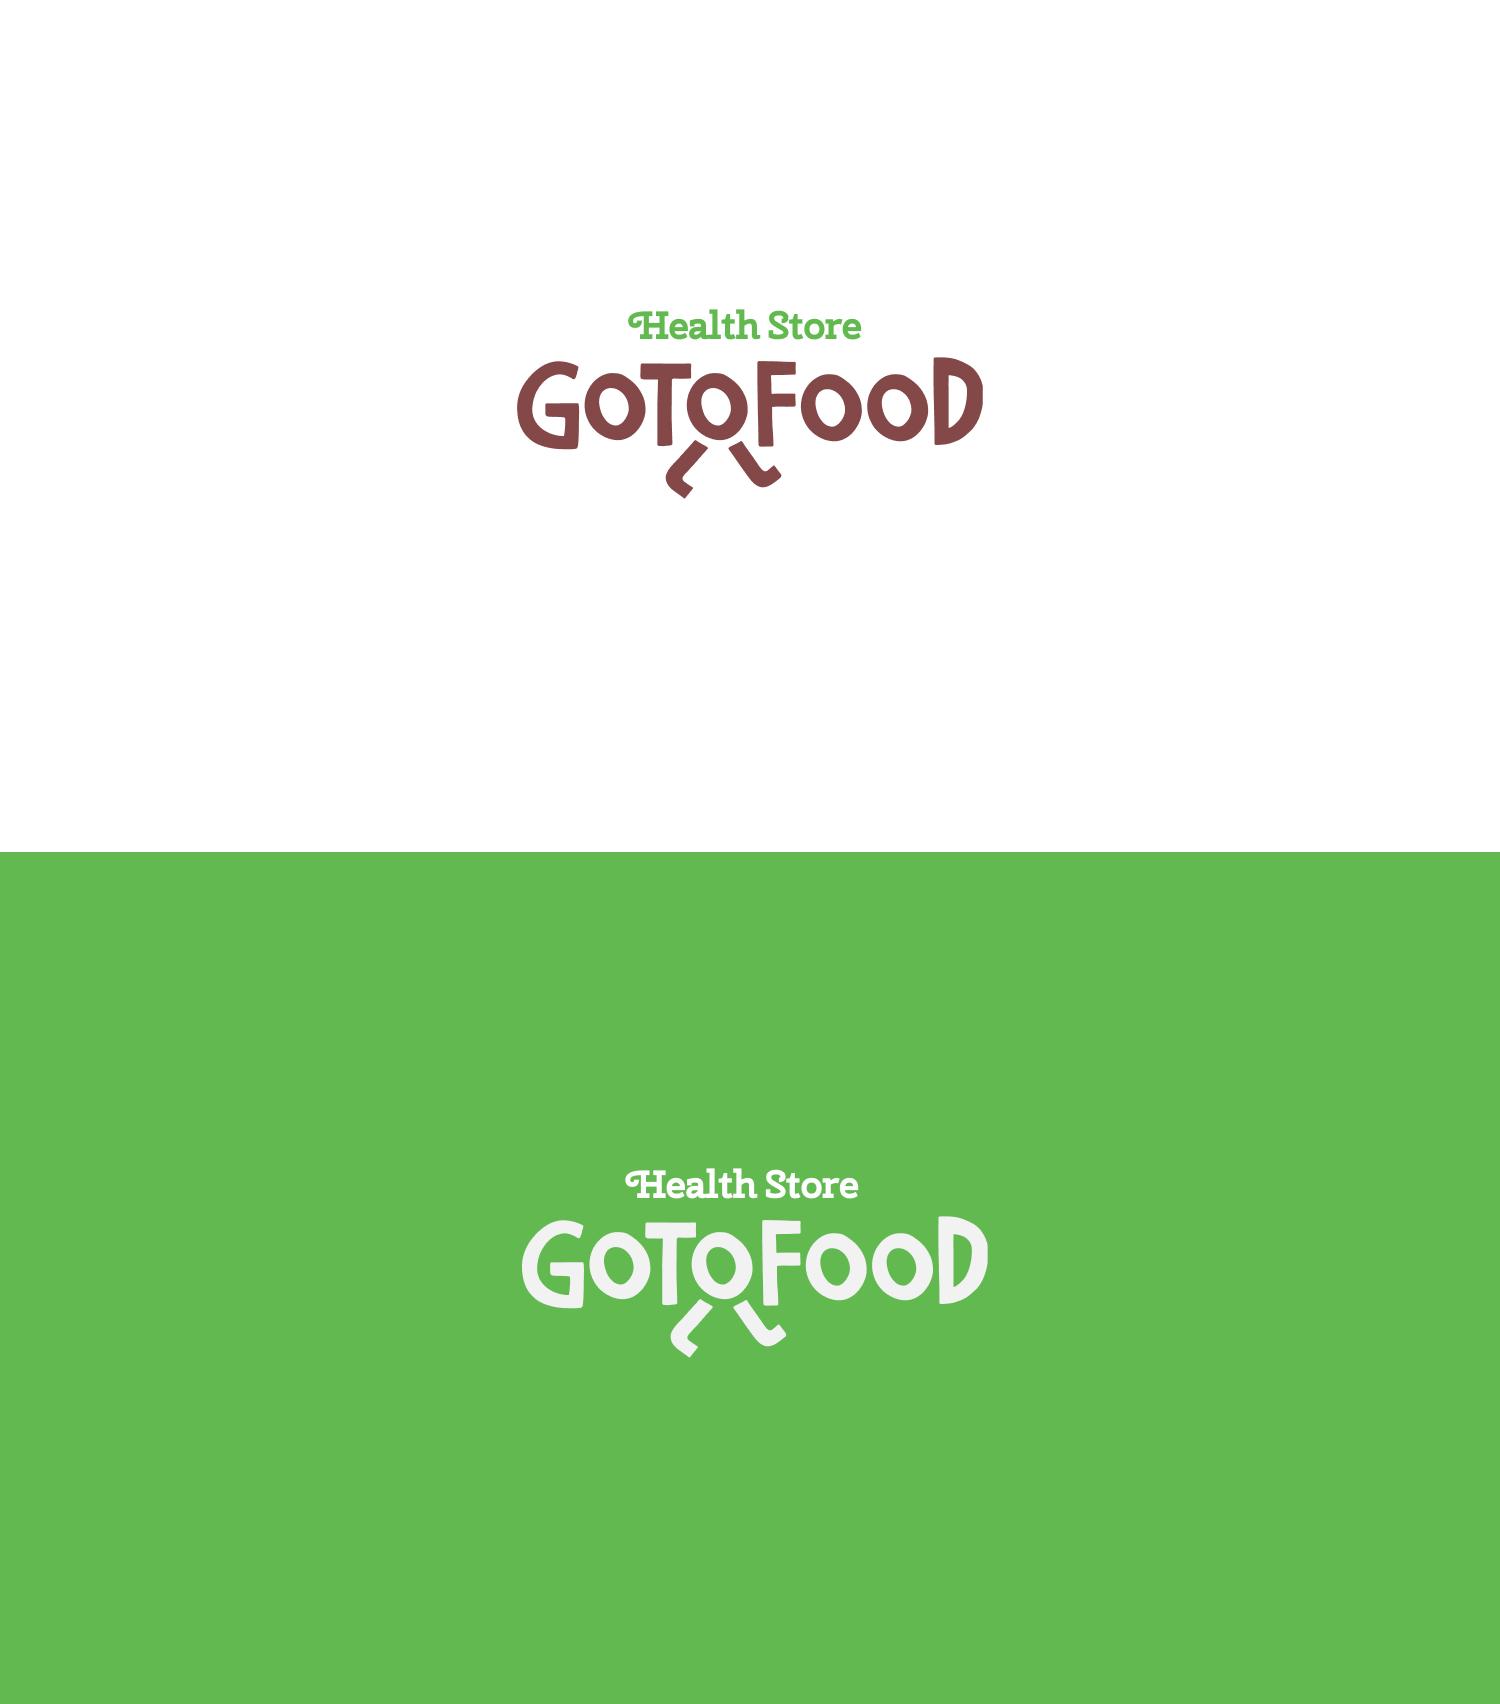 Логотип интернет-магазина здоровой еды фото f_8285cd4840f705e4.jpg